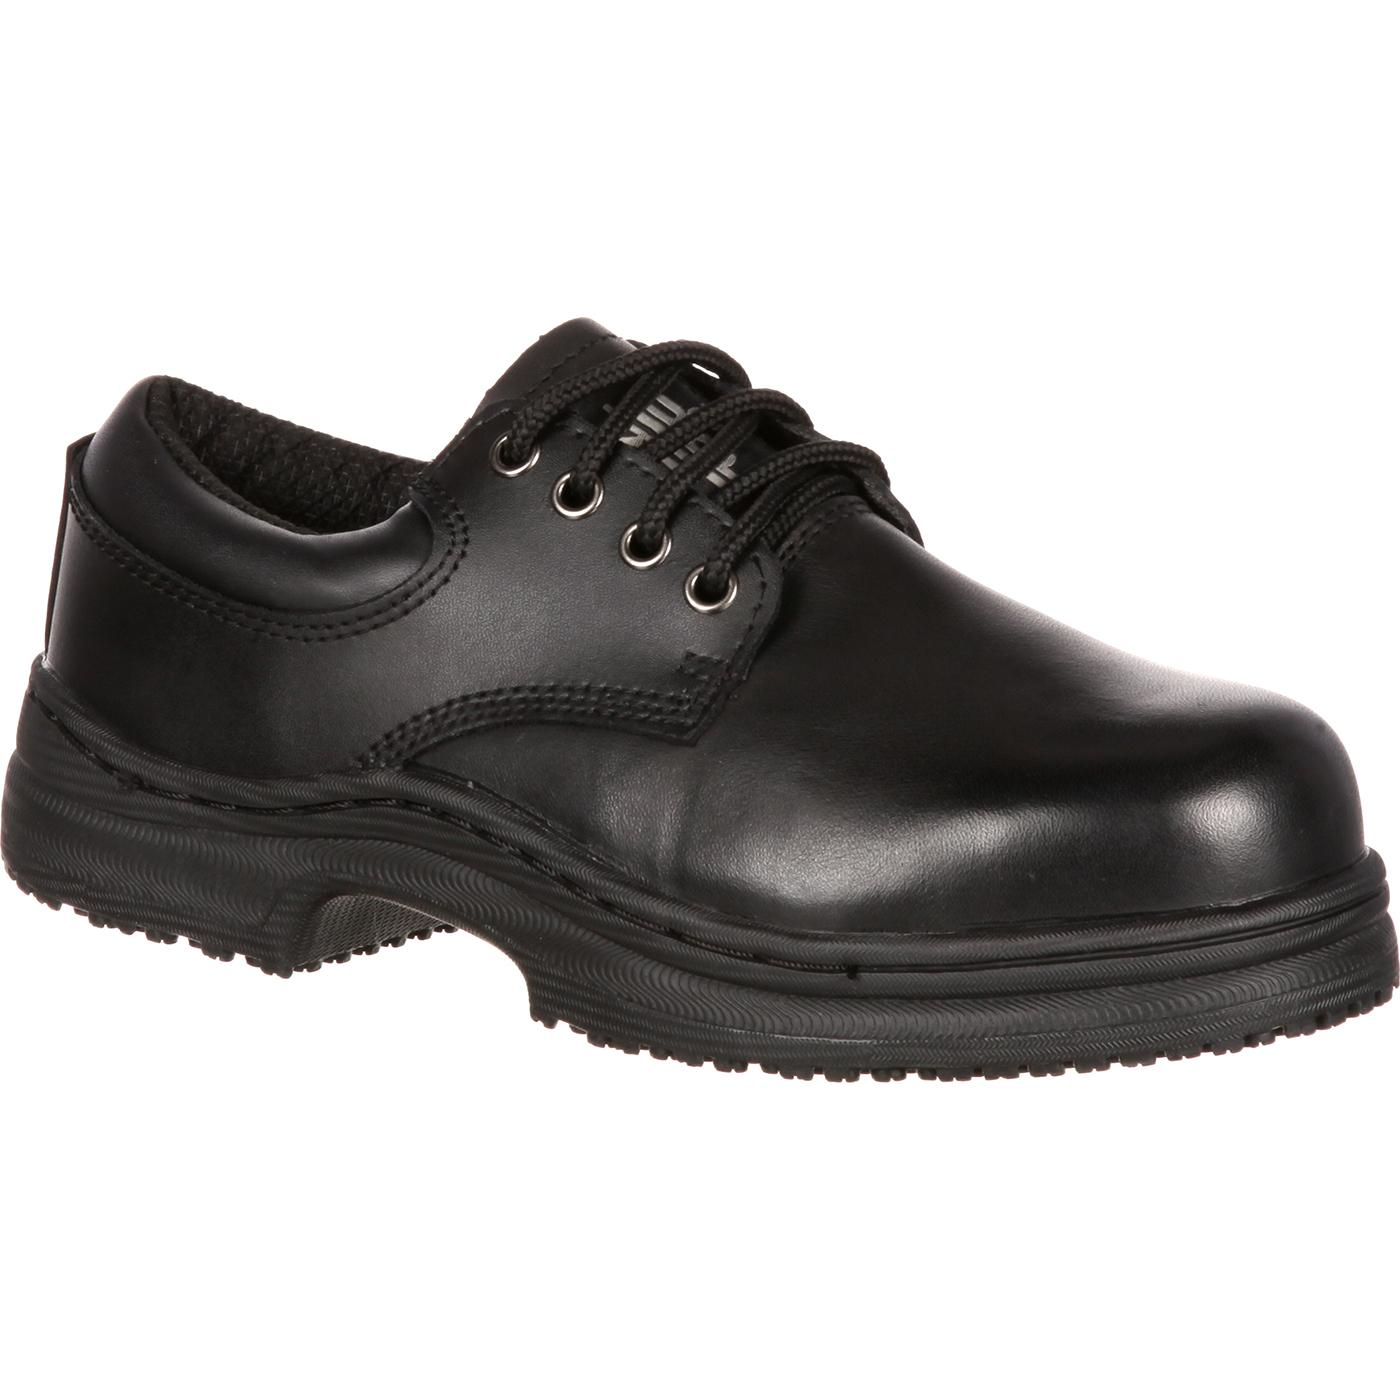 b890408995b Men's Work Footwear & Apparel   Lehigh Outfitters